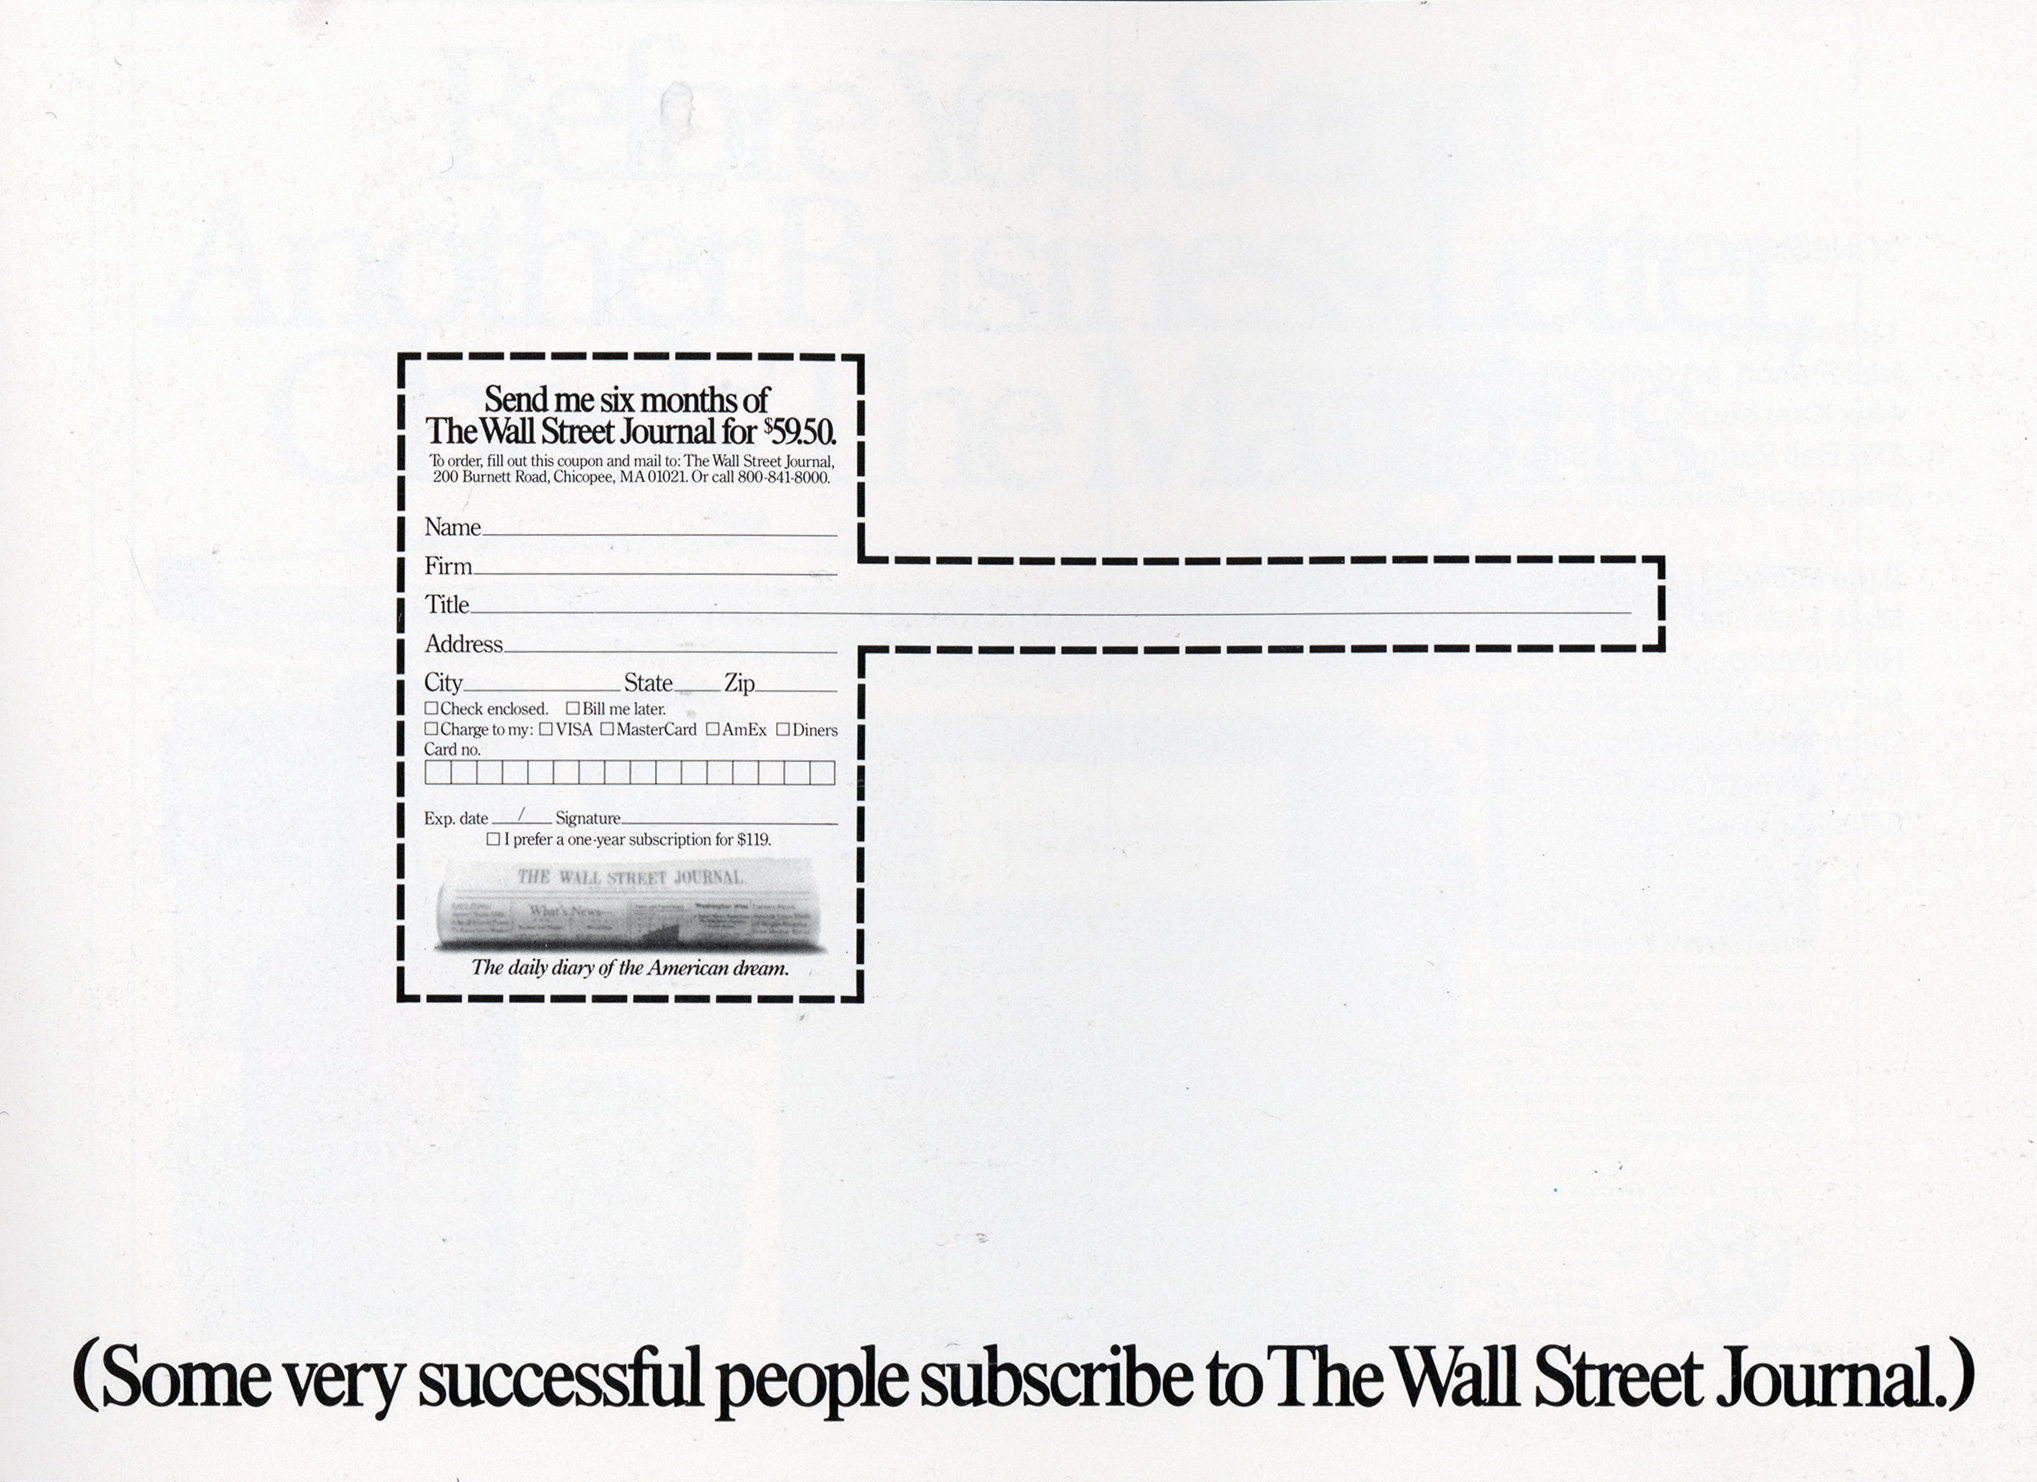 Tom McElligott, Wall Street Journal 'Title'-01